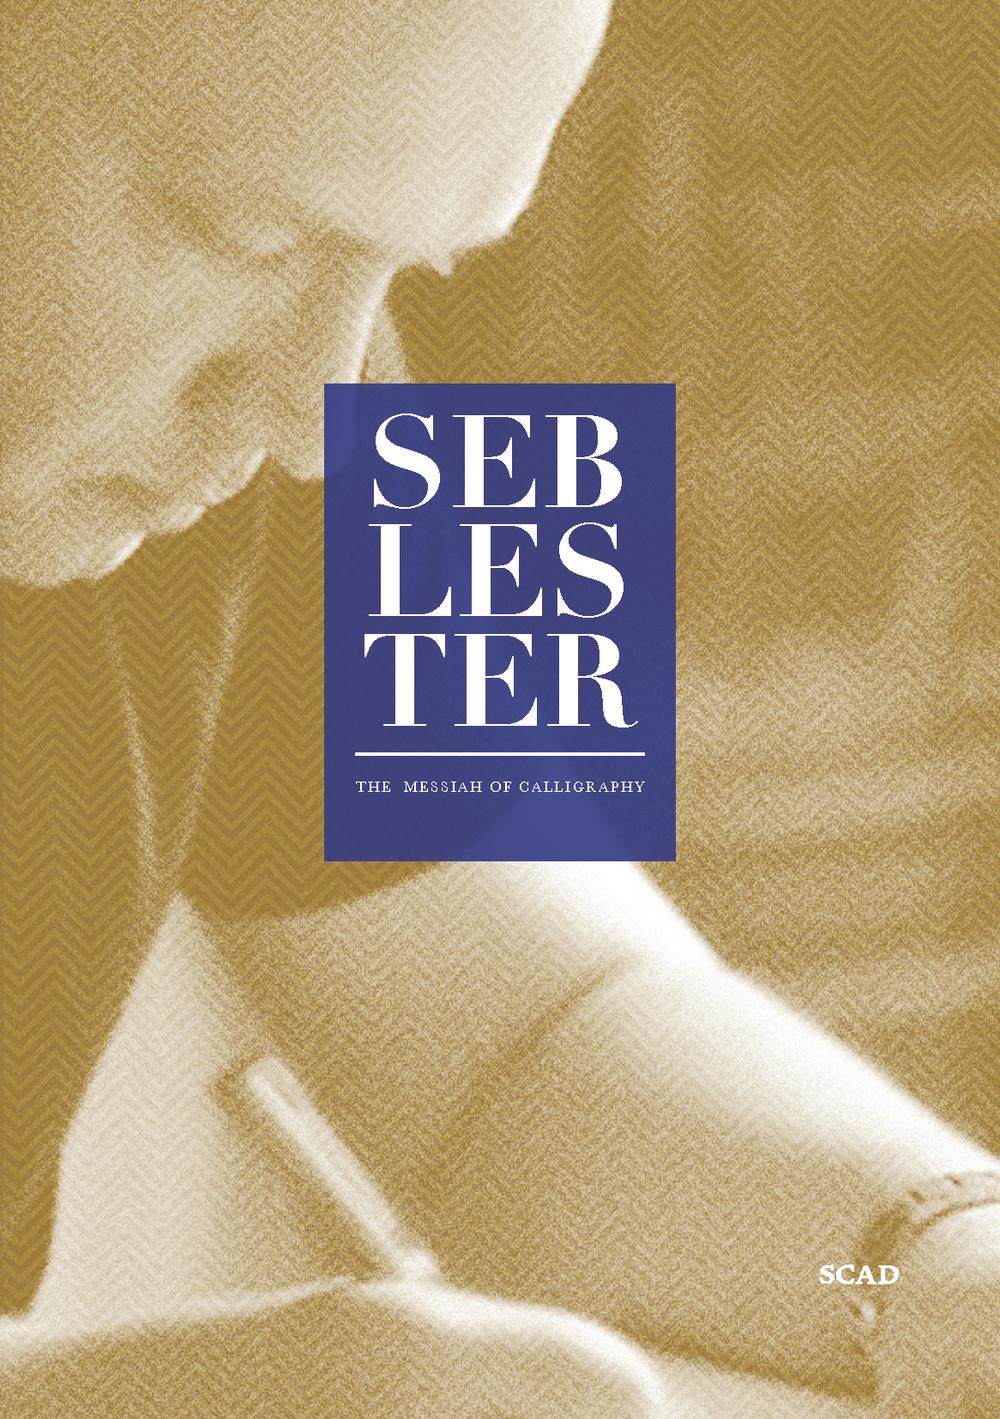 seb_lester copy_Page_1.png